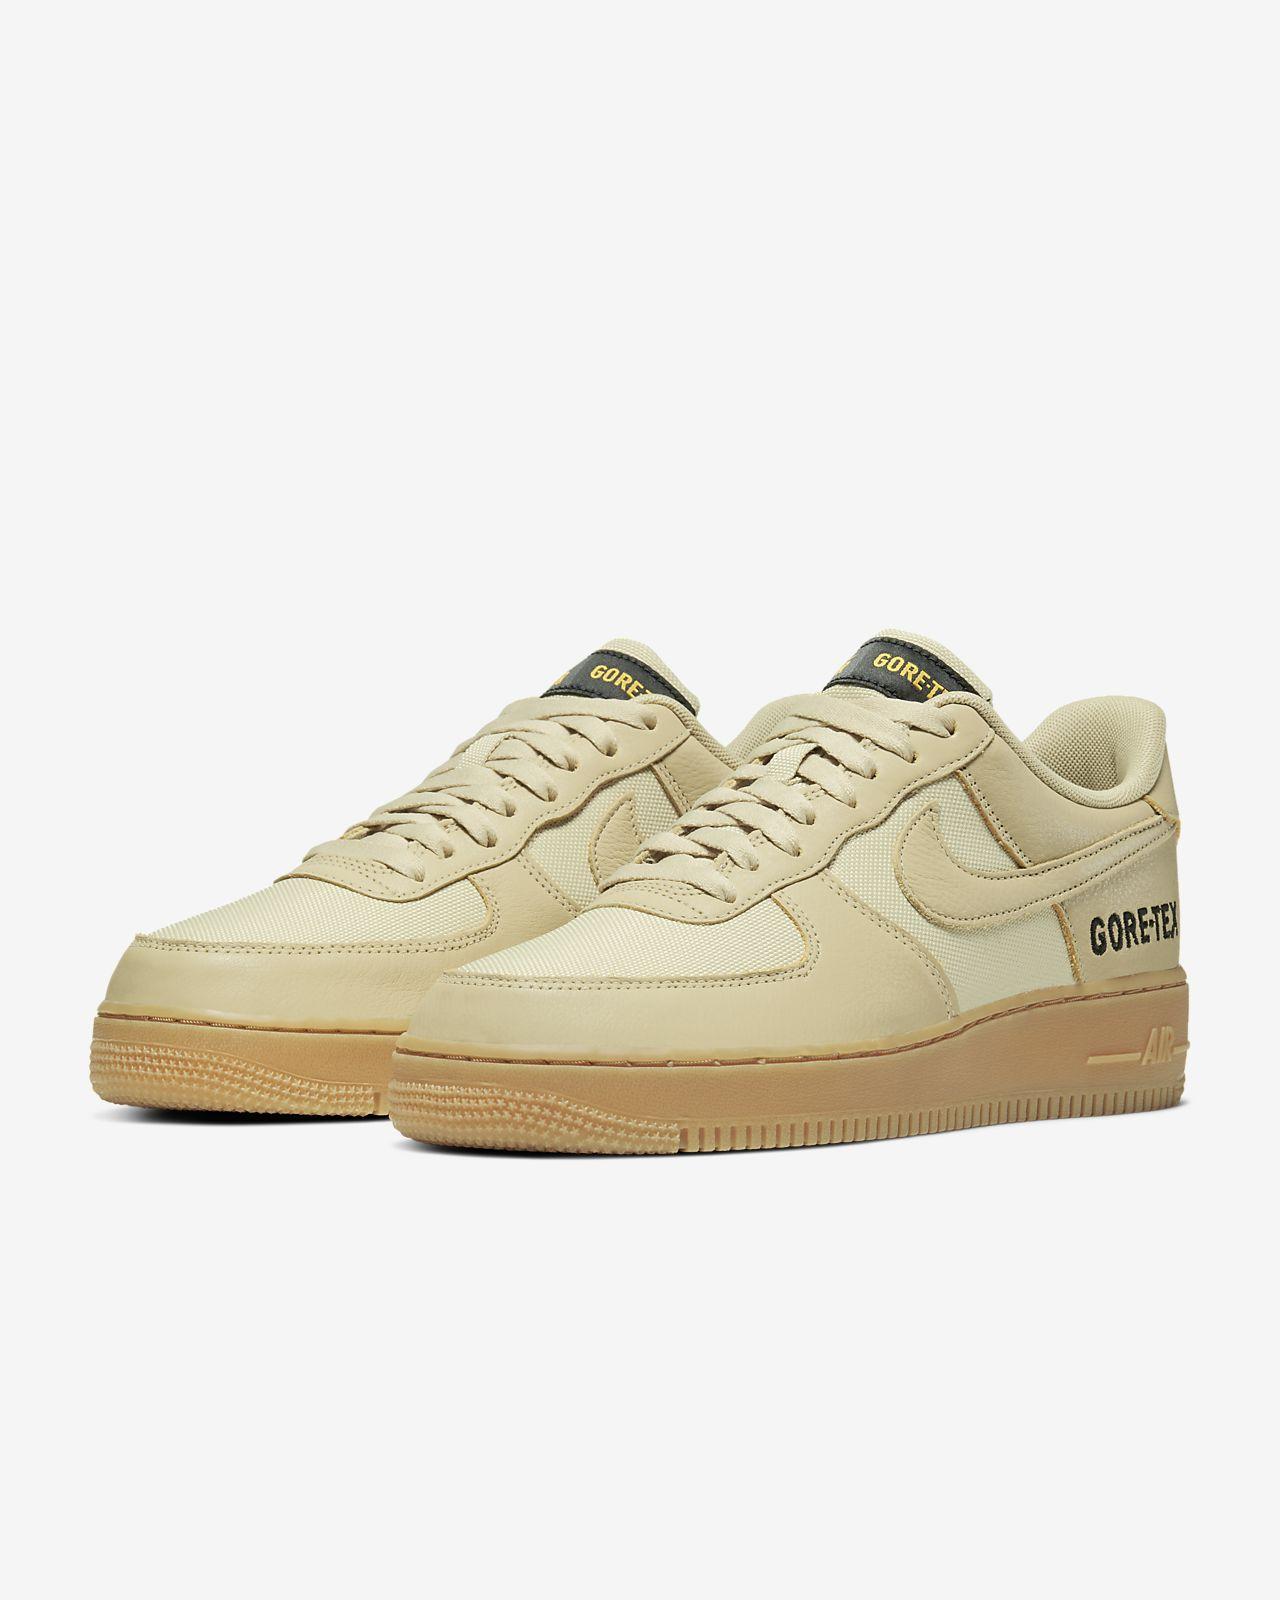 Nike Air Force 1 '07 LV8 Style Men's Shoe Size 10 (Flat